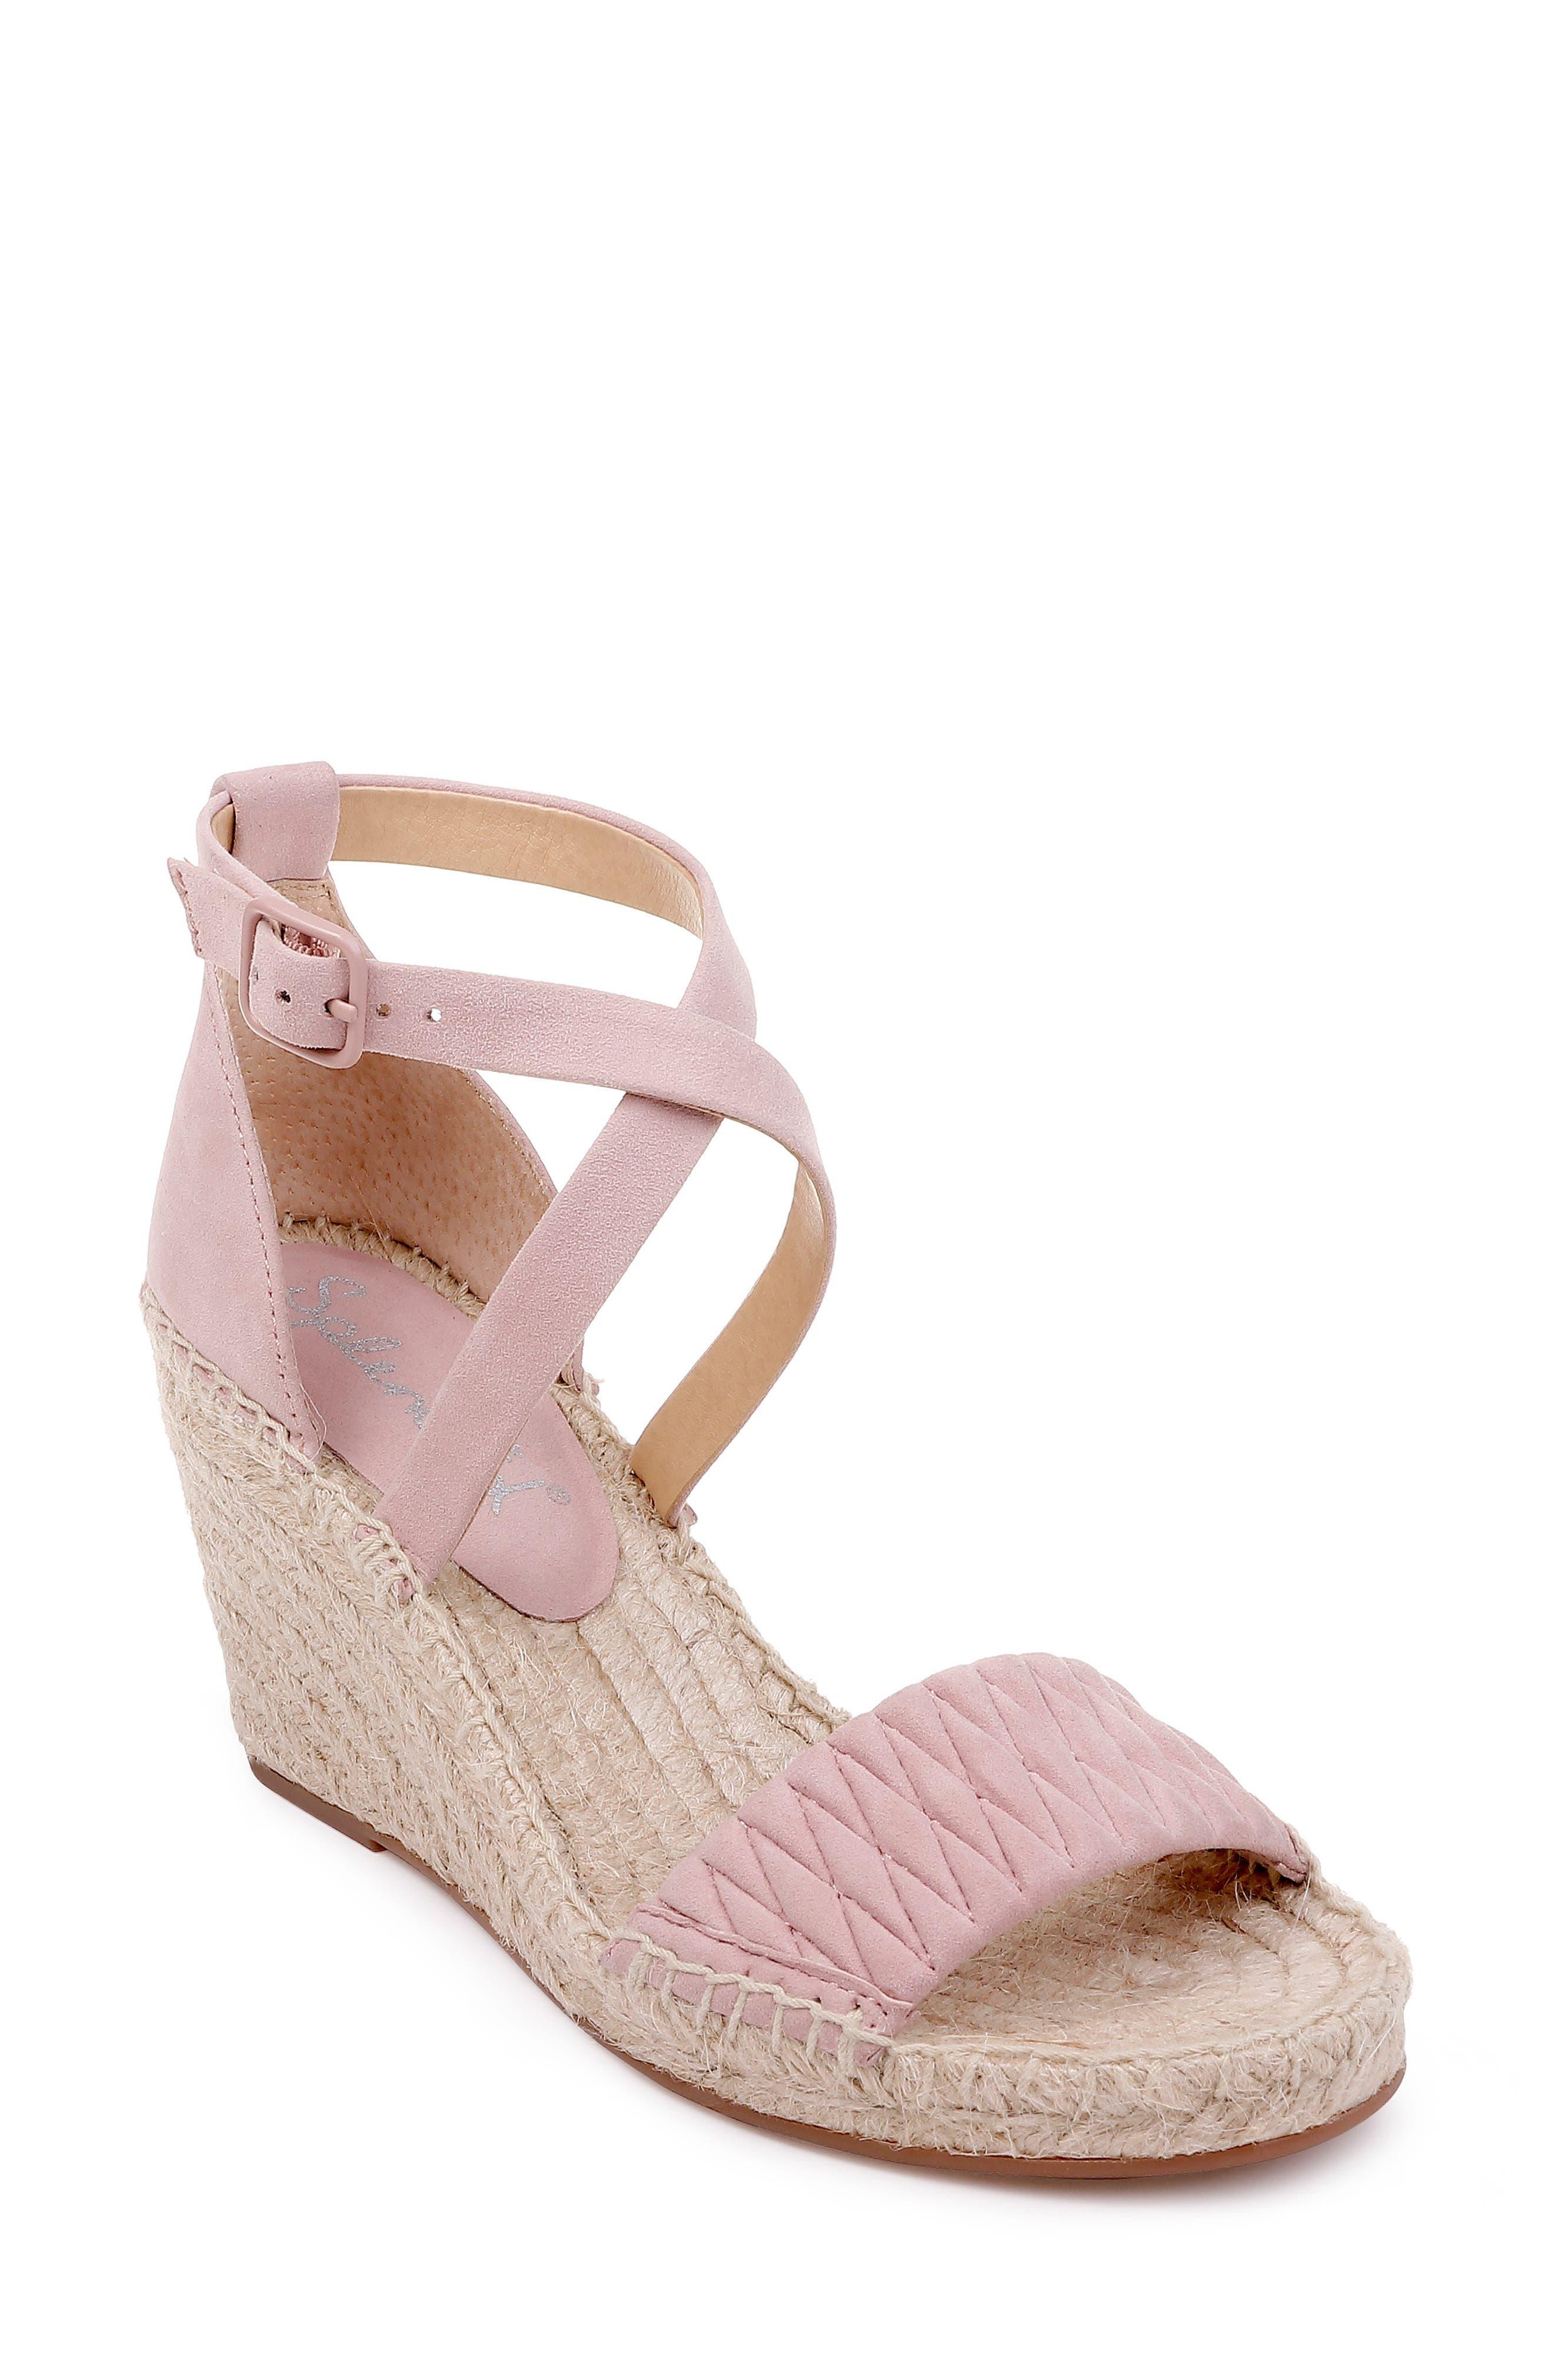 Splendid Sheri Wedge Espadrille Sandal, Pink